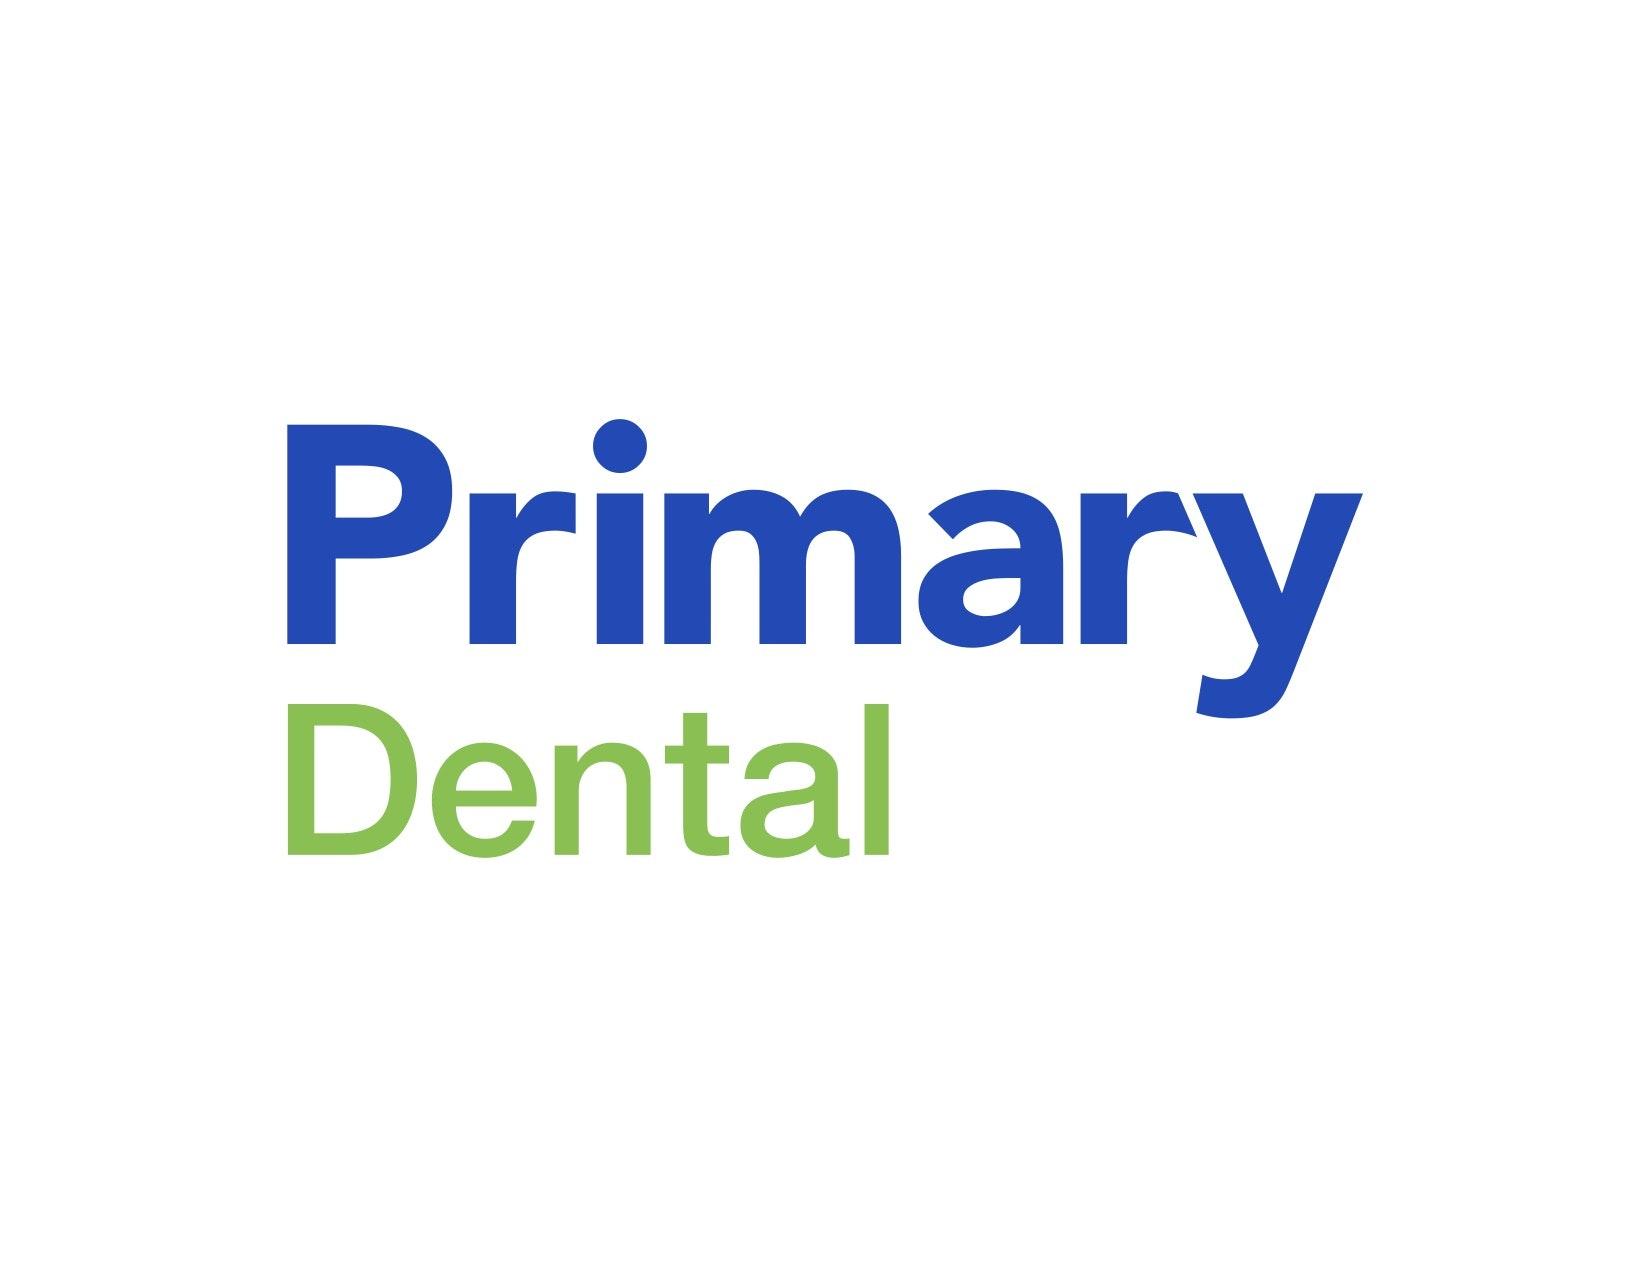 Springfield Medical & Dental Centre (Primary Dental)